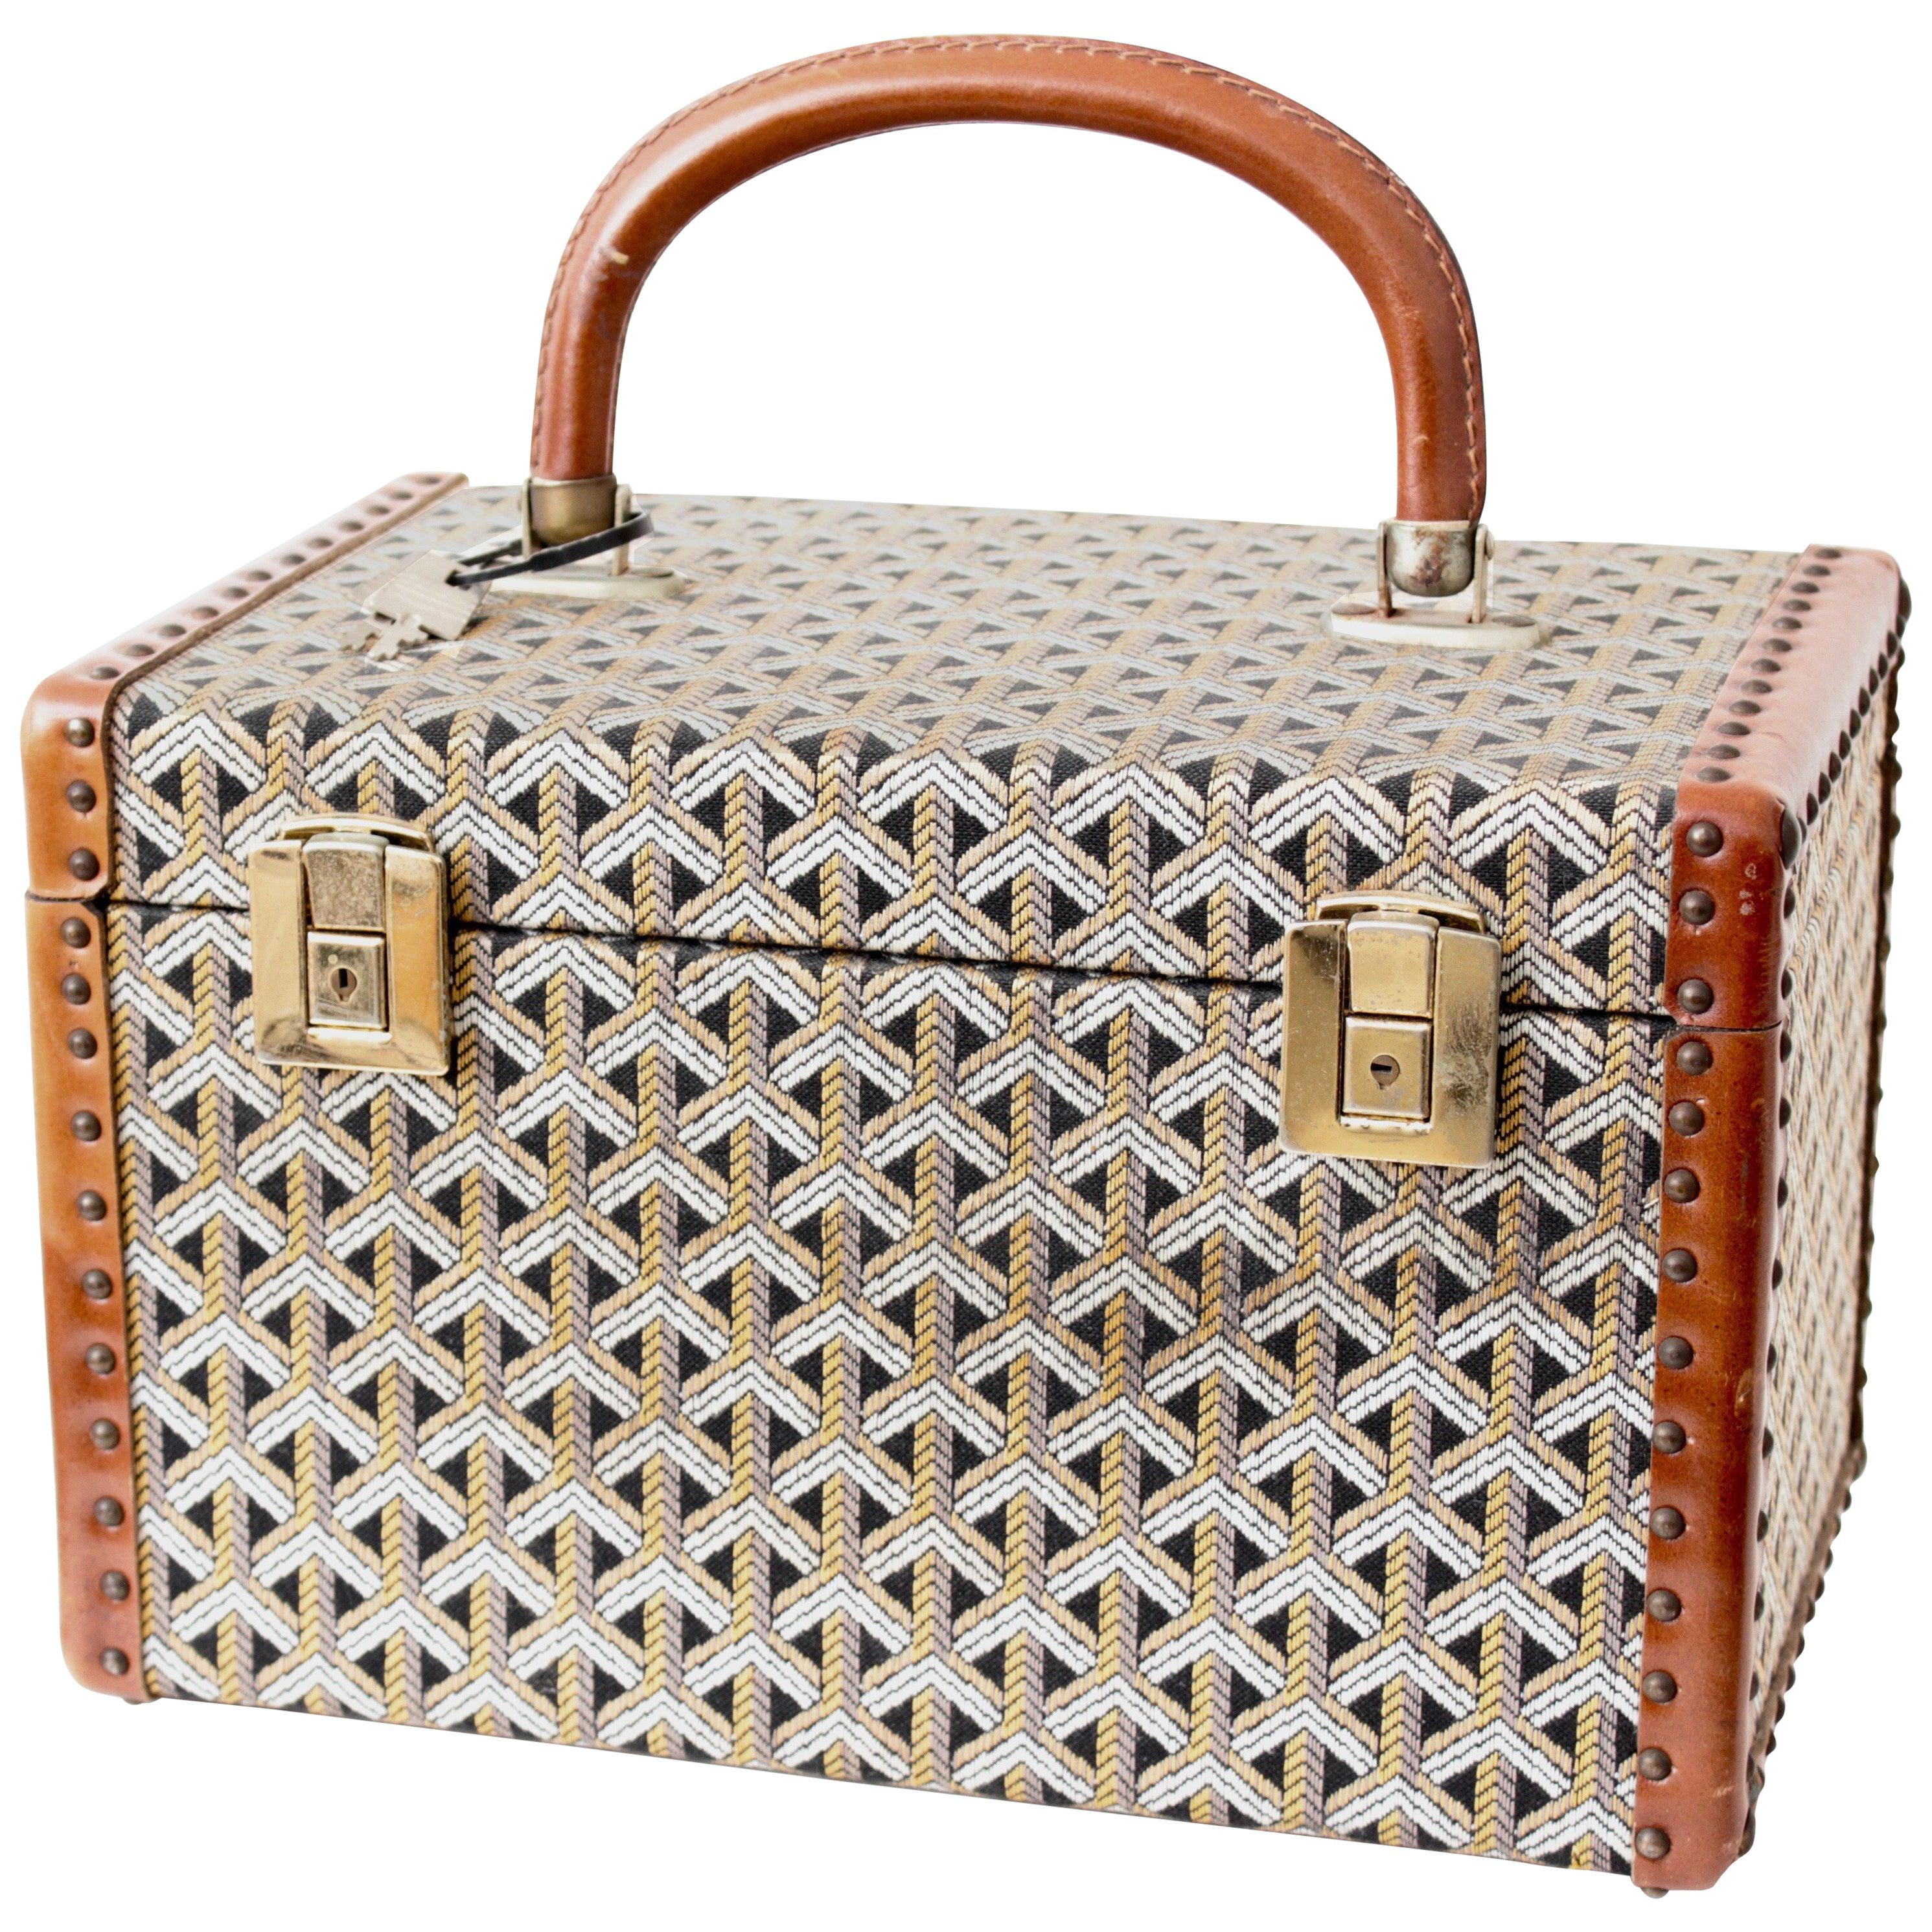 68913b72c5b2 Goyard Paris Vintage Vanity Train Case Mini Trunk Beauty Bag Carry On,  1960s at 1stdibs